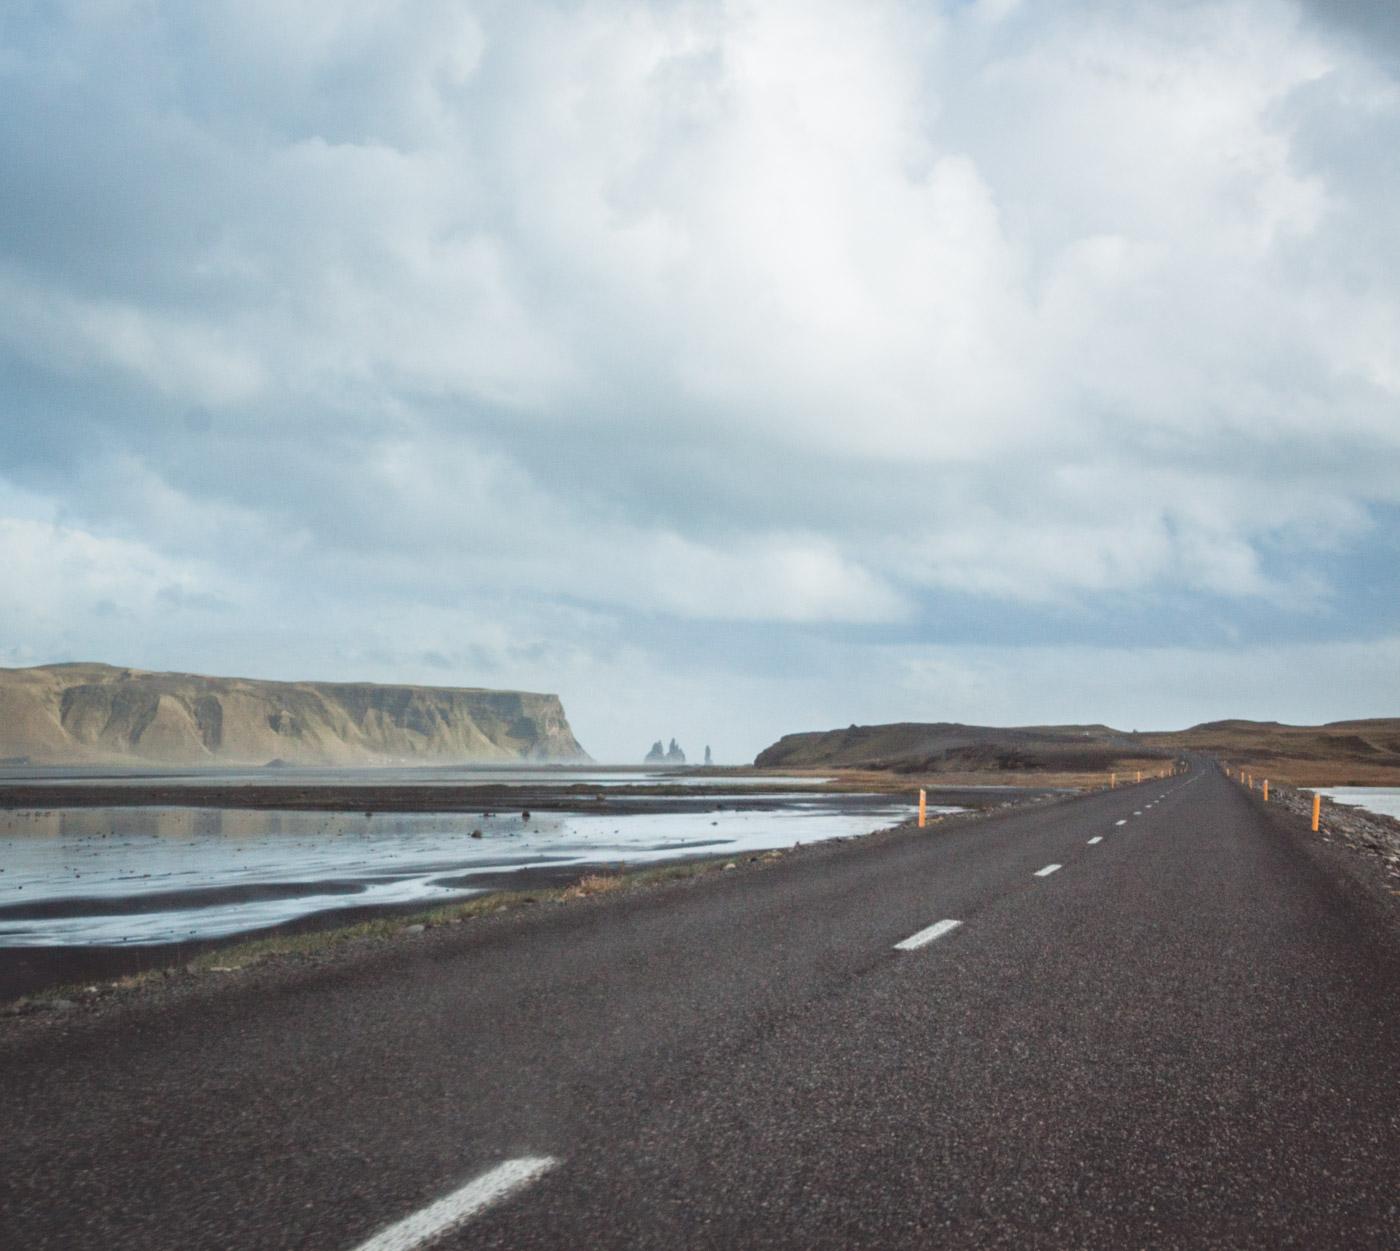 Islandia. Droga w okolicach Vik